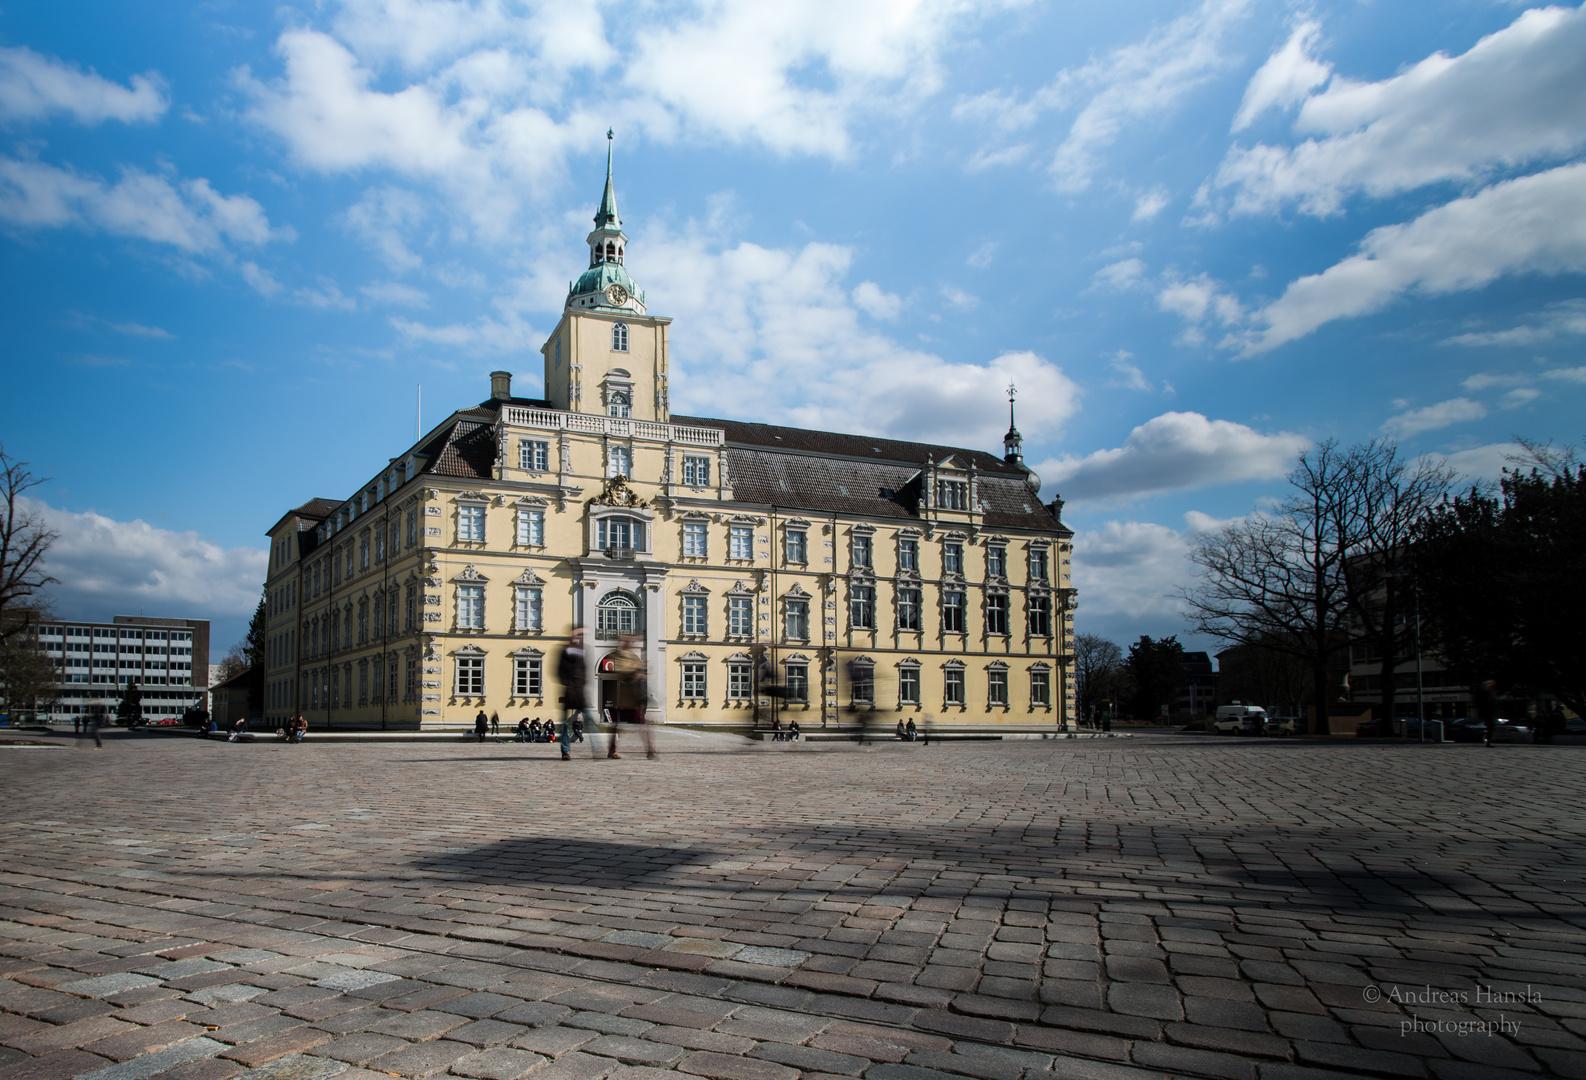 Oldenburger Schloß